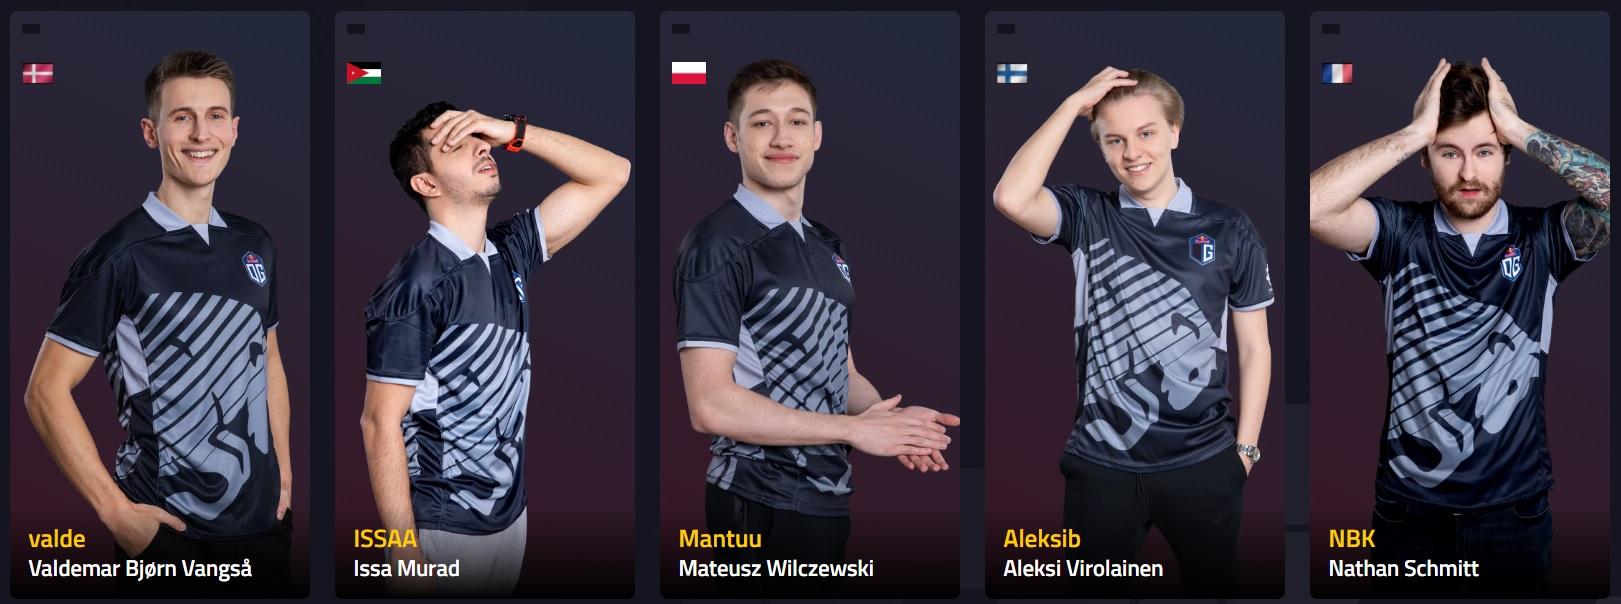 "OG CS:GO team players Nathan Jordan ""NBK-"" Schmitt, Aleksi Antti Kaarlo ""Aleksib"" Virolainen, Valdemar Bjørn ""valde"" Vangså, Issa Sameer Issa ""ISSAA"" Murad, and Mateusz ""mantuu"" Wilczewski"